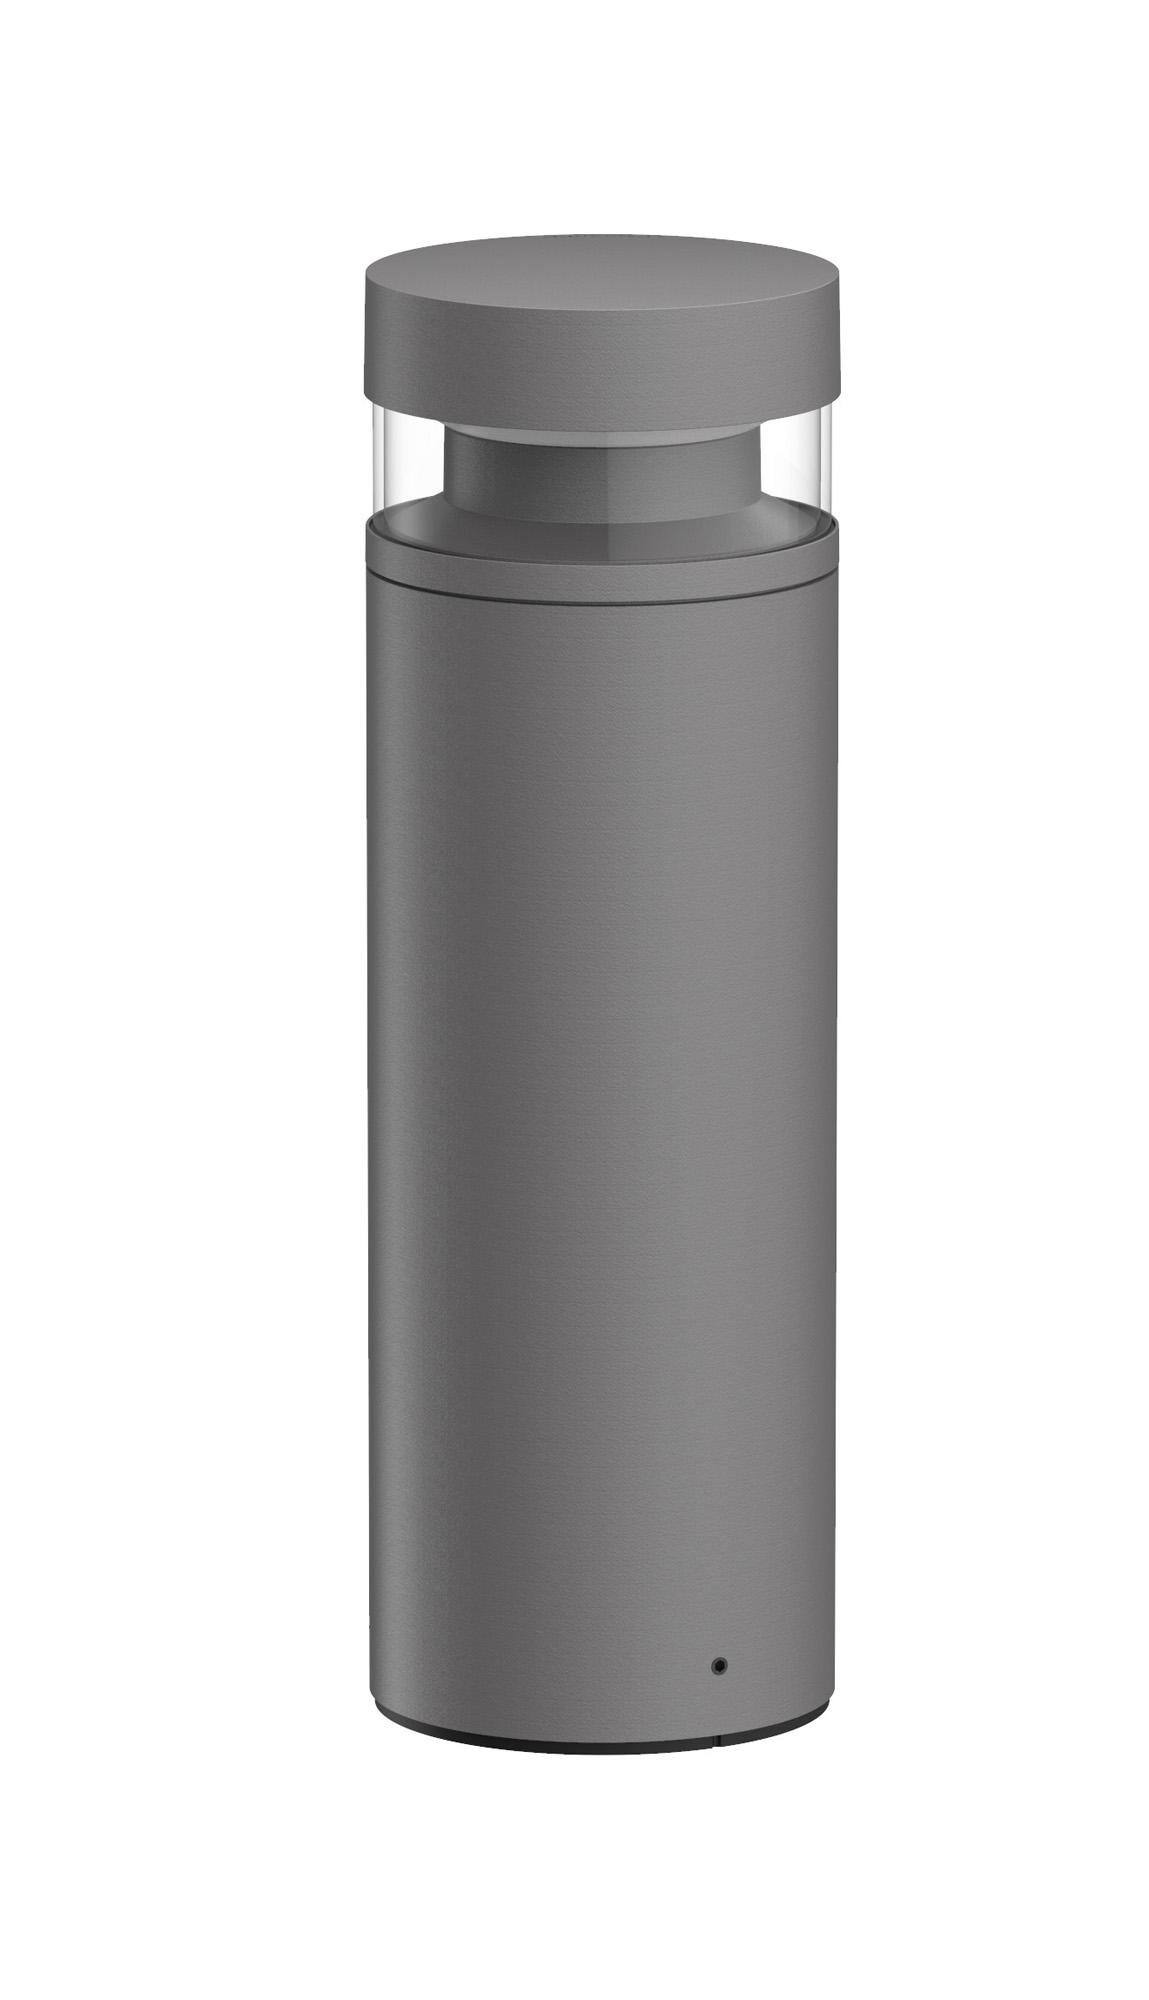 Välisvalgusti TOK 400mm, LED 13W 703lm 3000K; roostevaba teras, corten, IP66 IK10